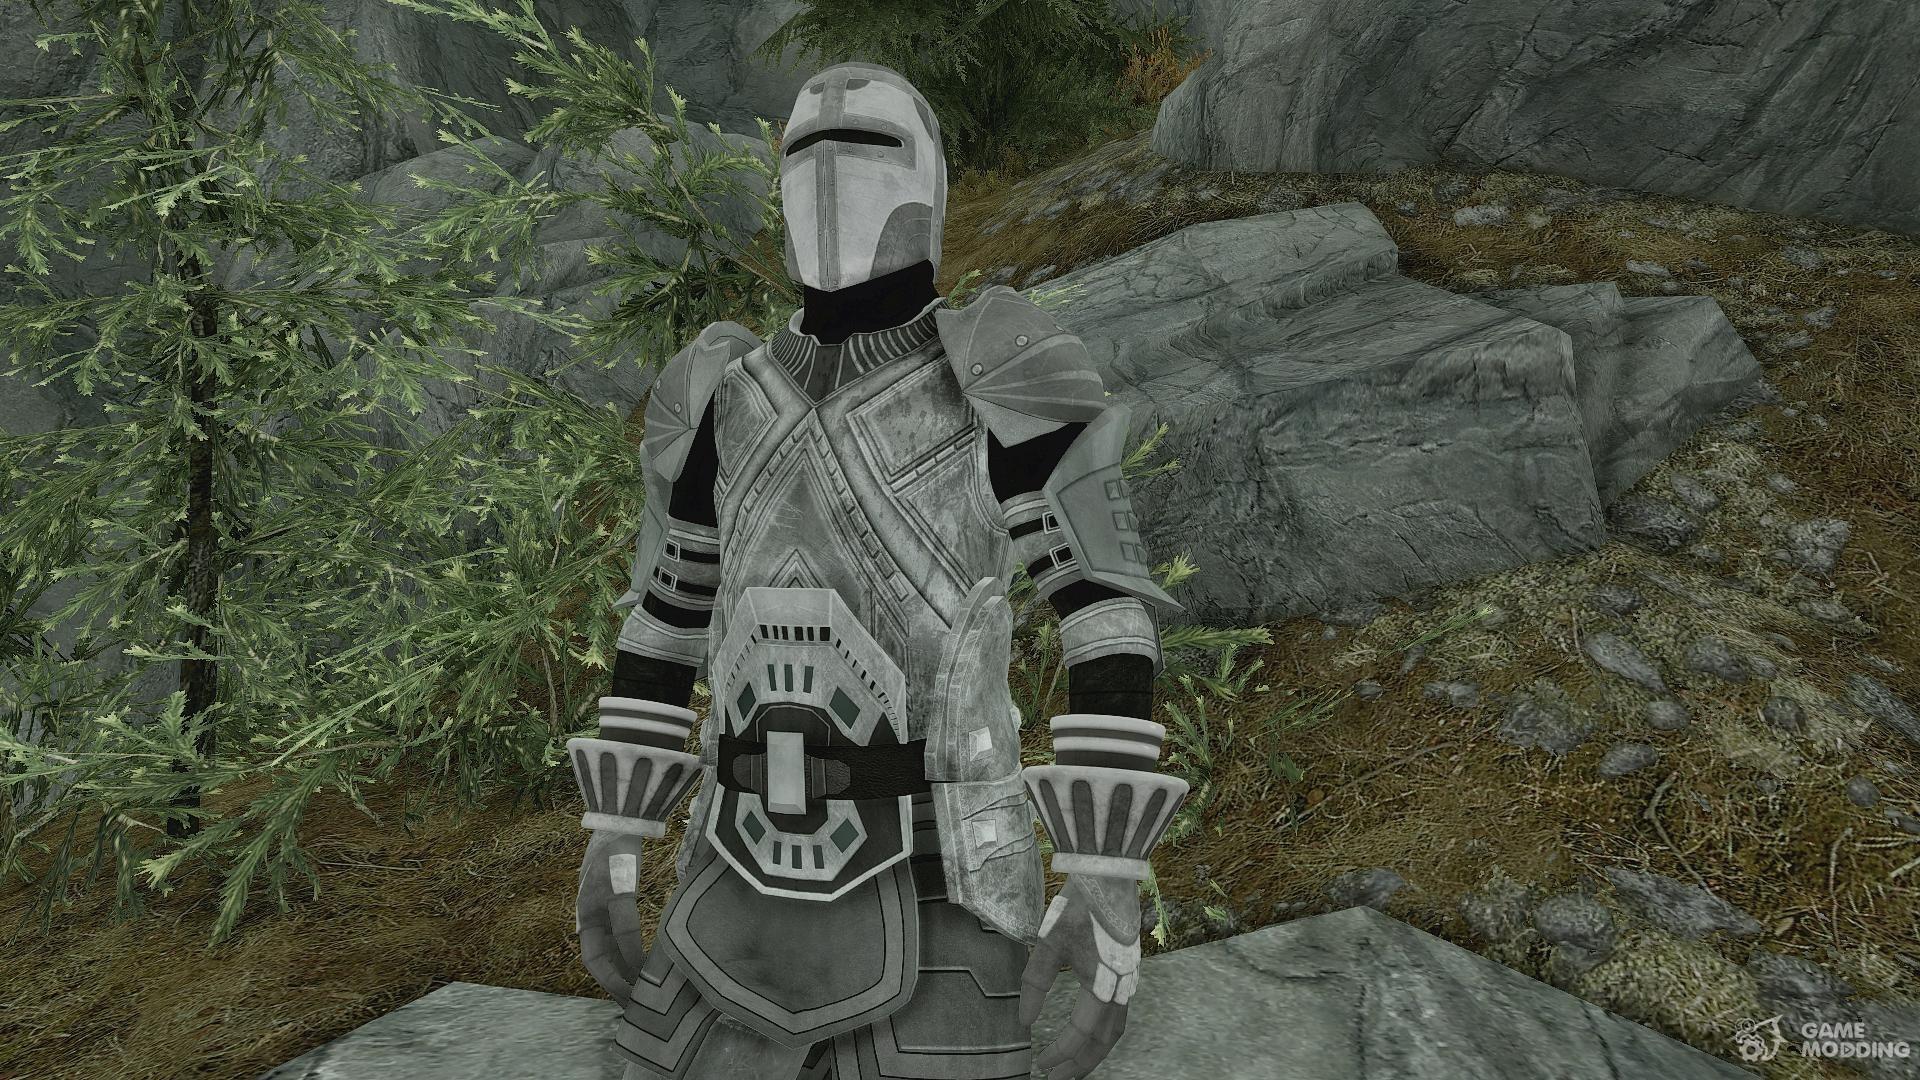 Dragon Age Series Blood Dragon Armor For Tes V Skyrim Immersive armors complete armor sets. dragon age series blood dragon armor